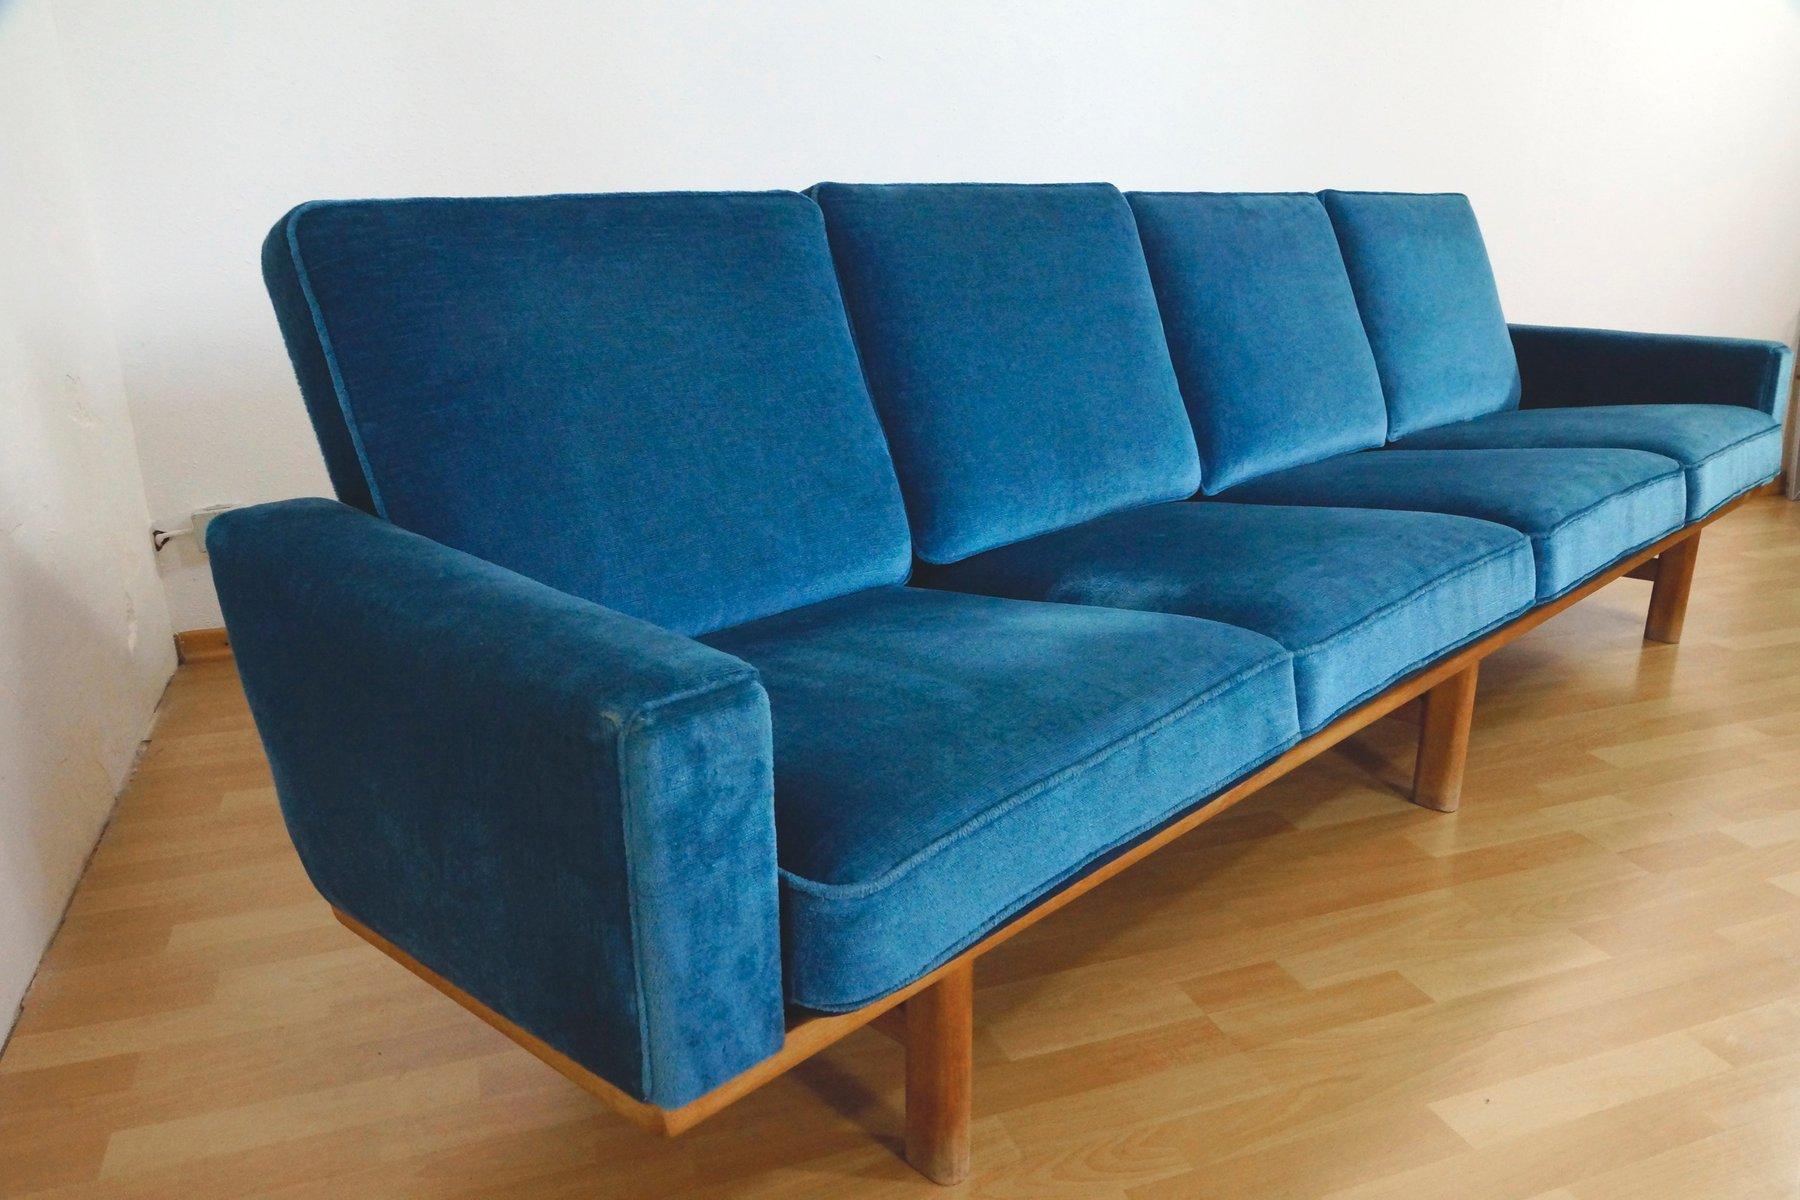 four seater oak velour sofa by hans j wegner for getama 1950s for sale at pamono. Black Bedroom Furniture Sets. Home Design Ideas